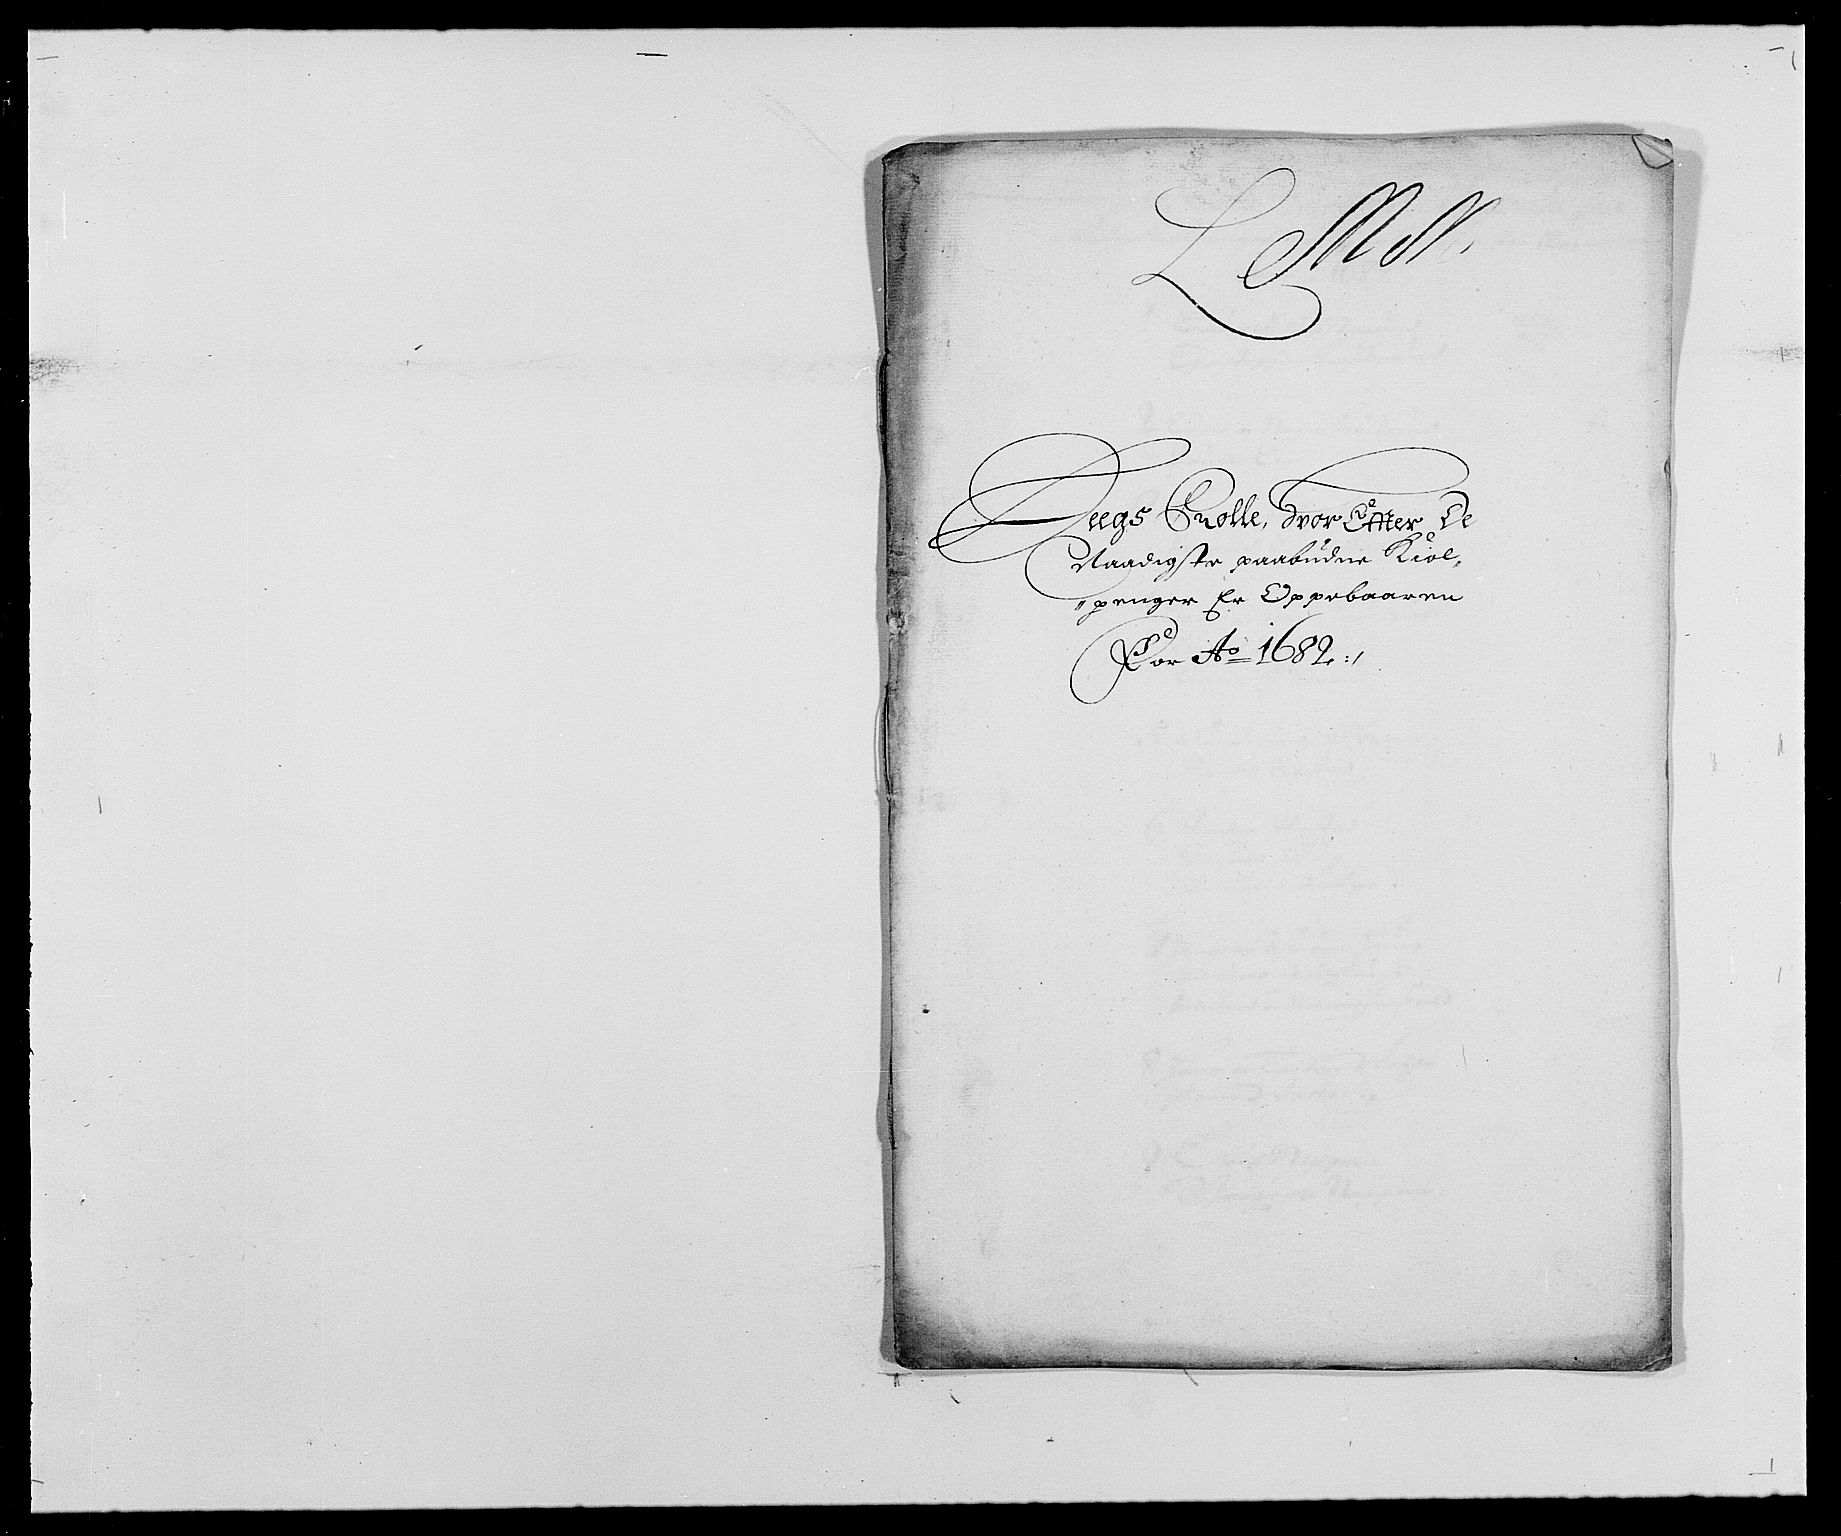 RA, Rentekammeret inntil 1814, Reviderte regnskaper, Fogderegnskap, R27/L1686: Fogderegnskap Lier, 1678-1686, s. 416